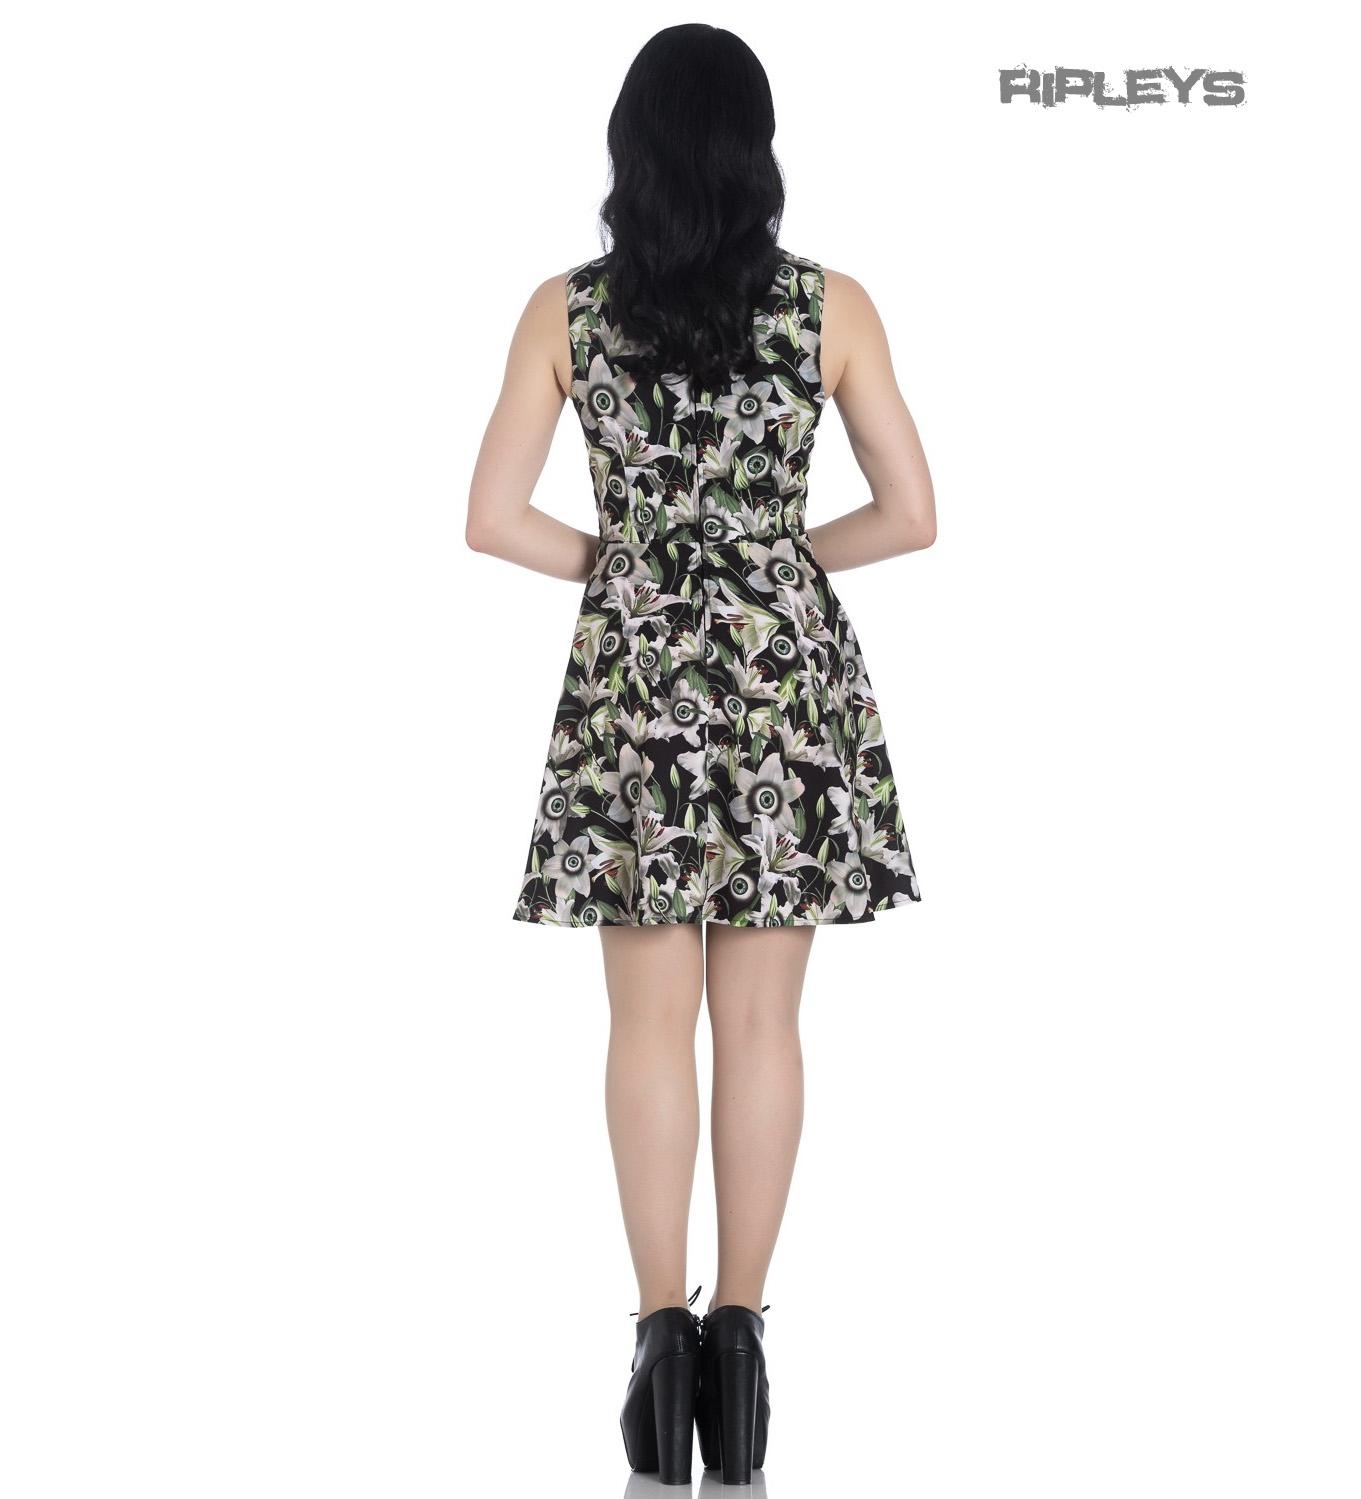 Hell-Bunny-Black-Lace-Up-Goth-Punk-Mini-Dress-PEEPERS-Eyeballs-Flowers-All-Sizes thumbnail 30